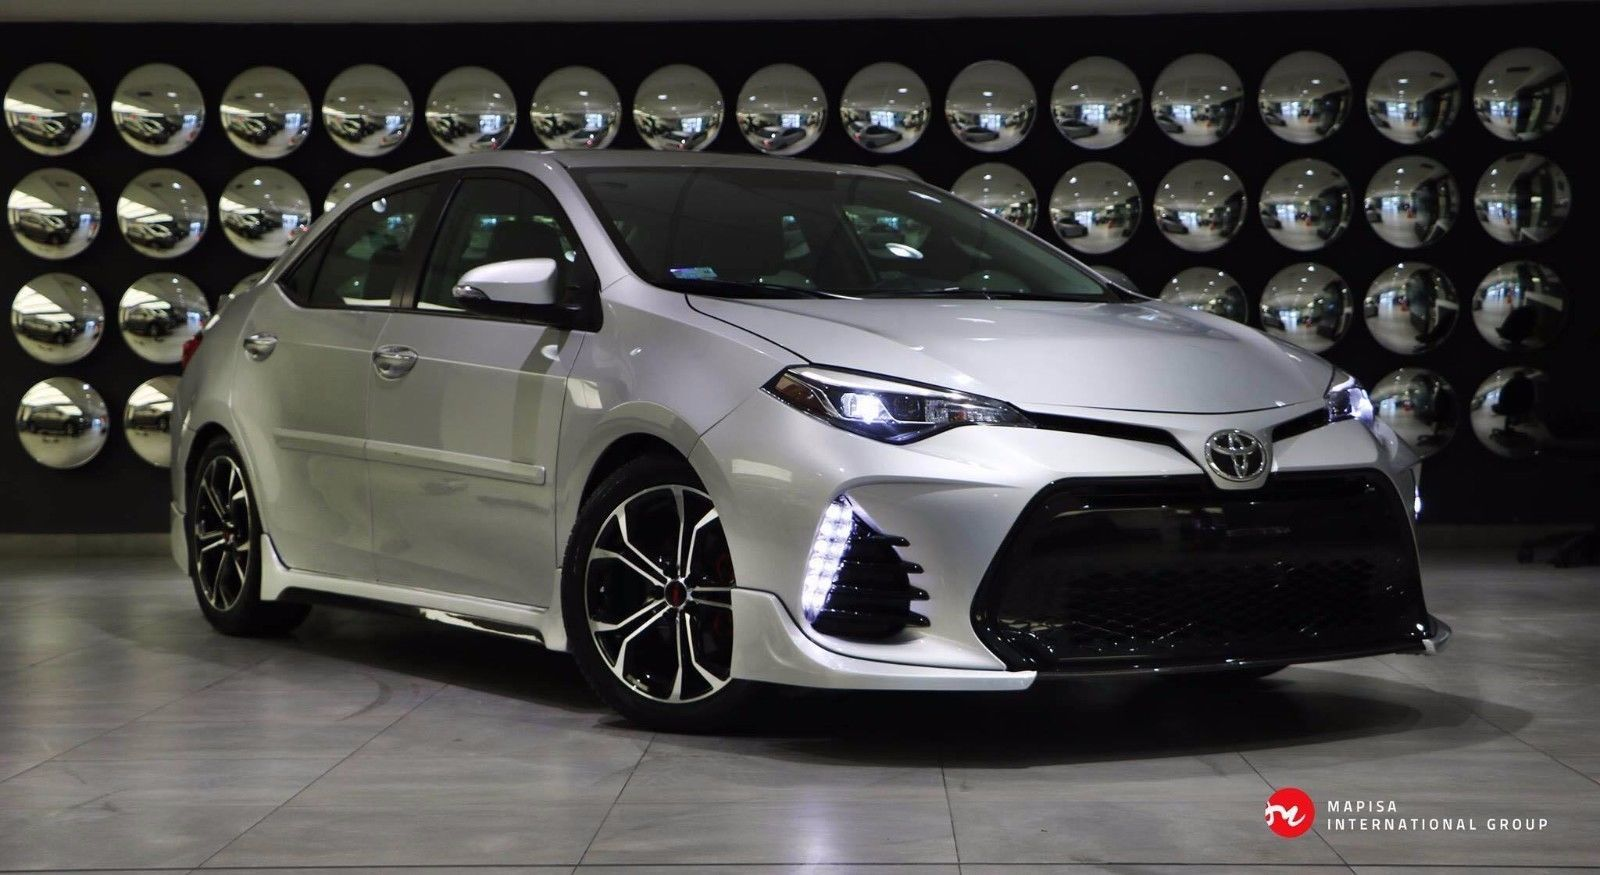 All New Corolla Altis Vs Civic Vellfire 2018 Cool Great Body Kit Toyota 2017 Quotse Quot Mah